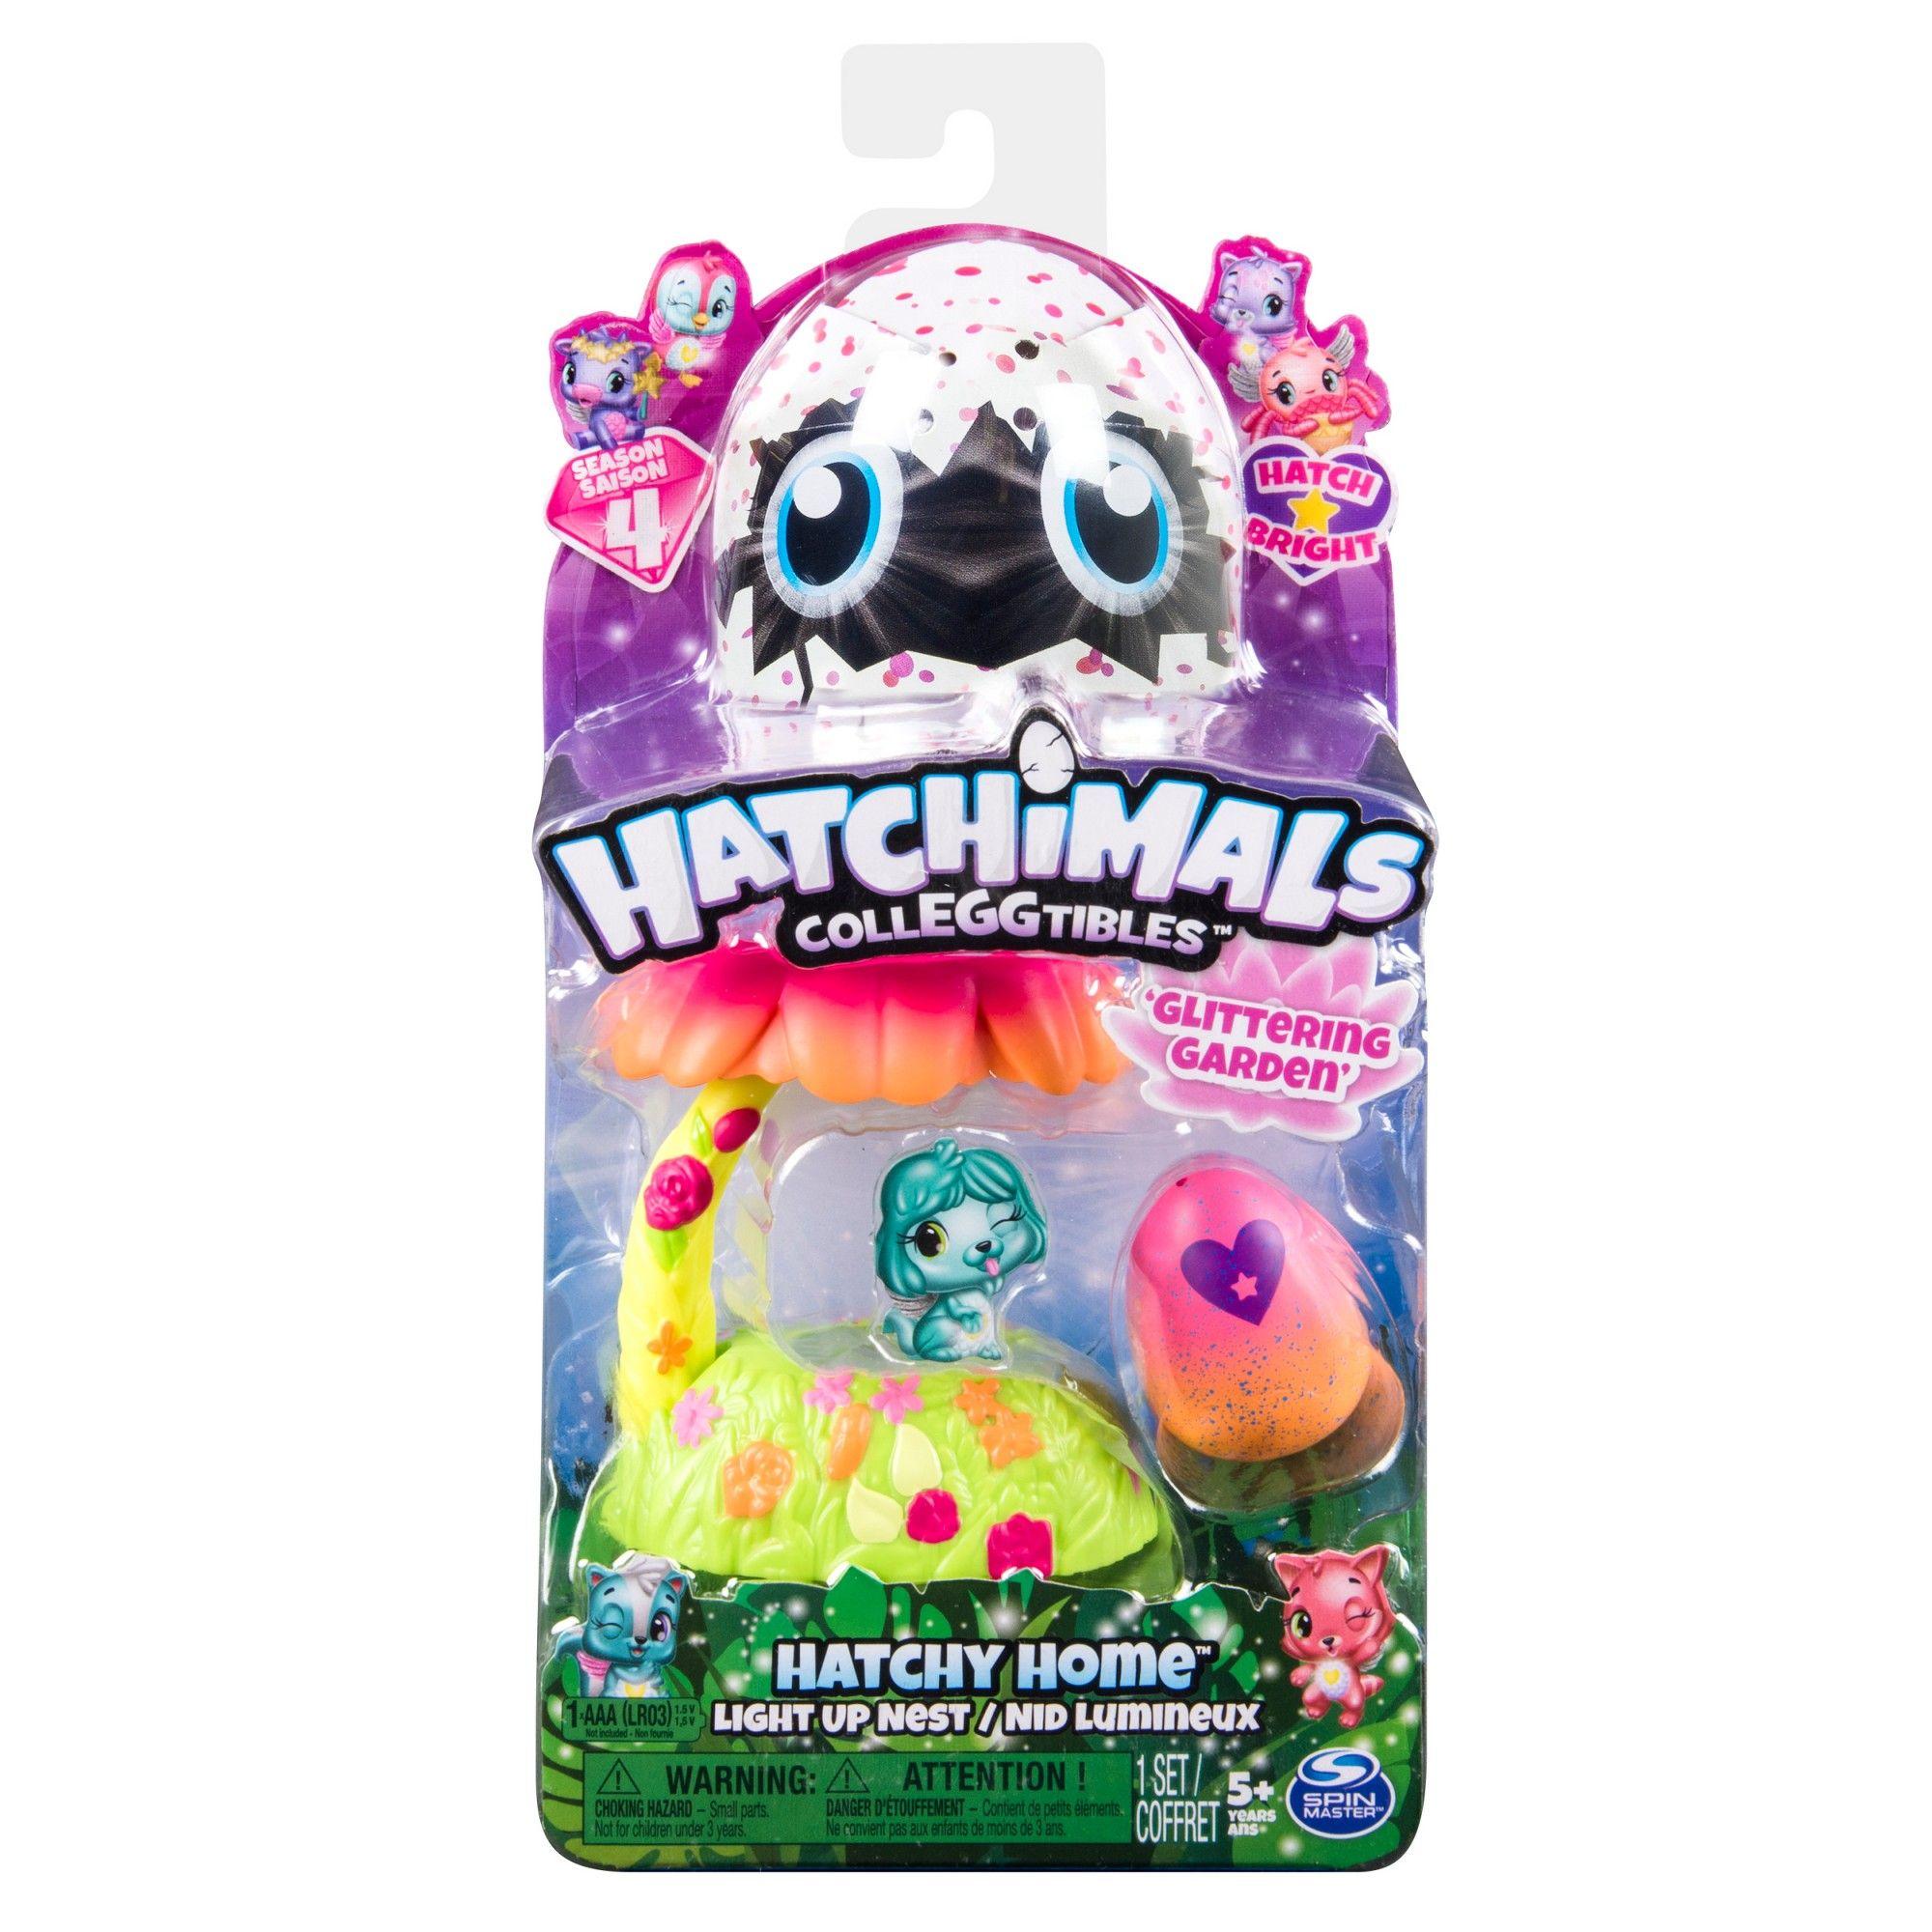 Hatchimals Colleggtibles Waterfall Slide Light Up Playset Exclusive Hatchimal